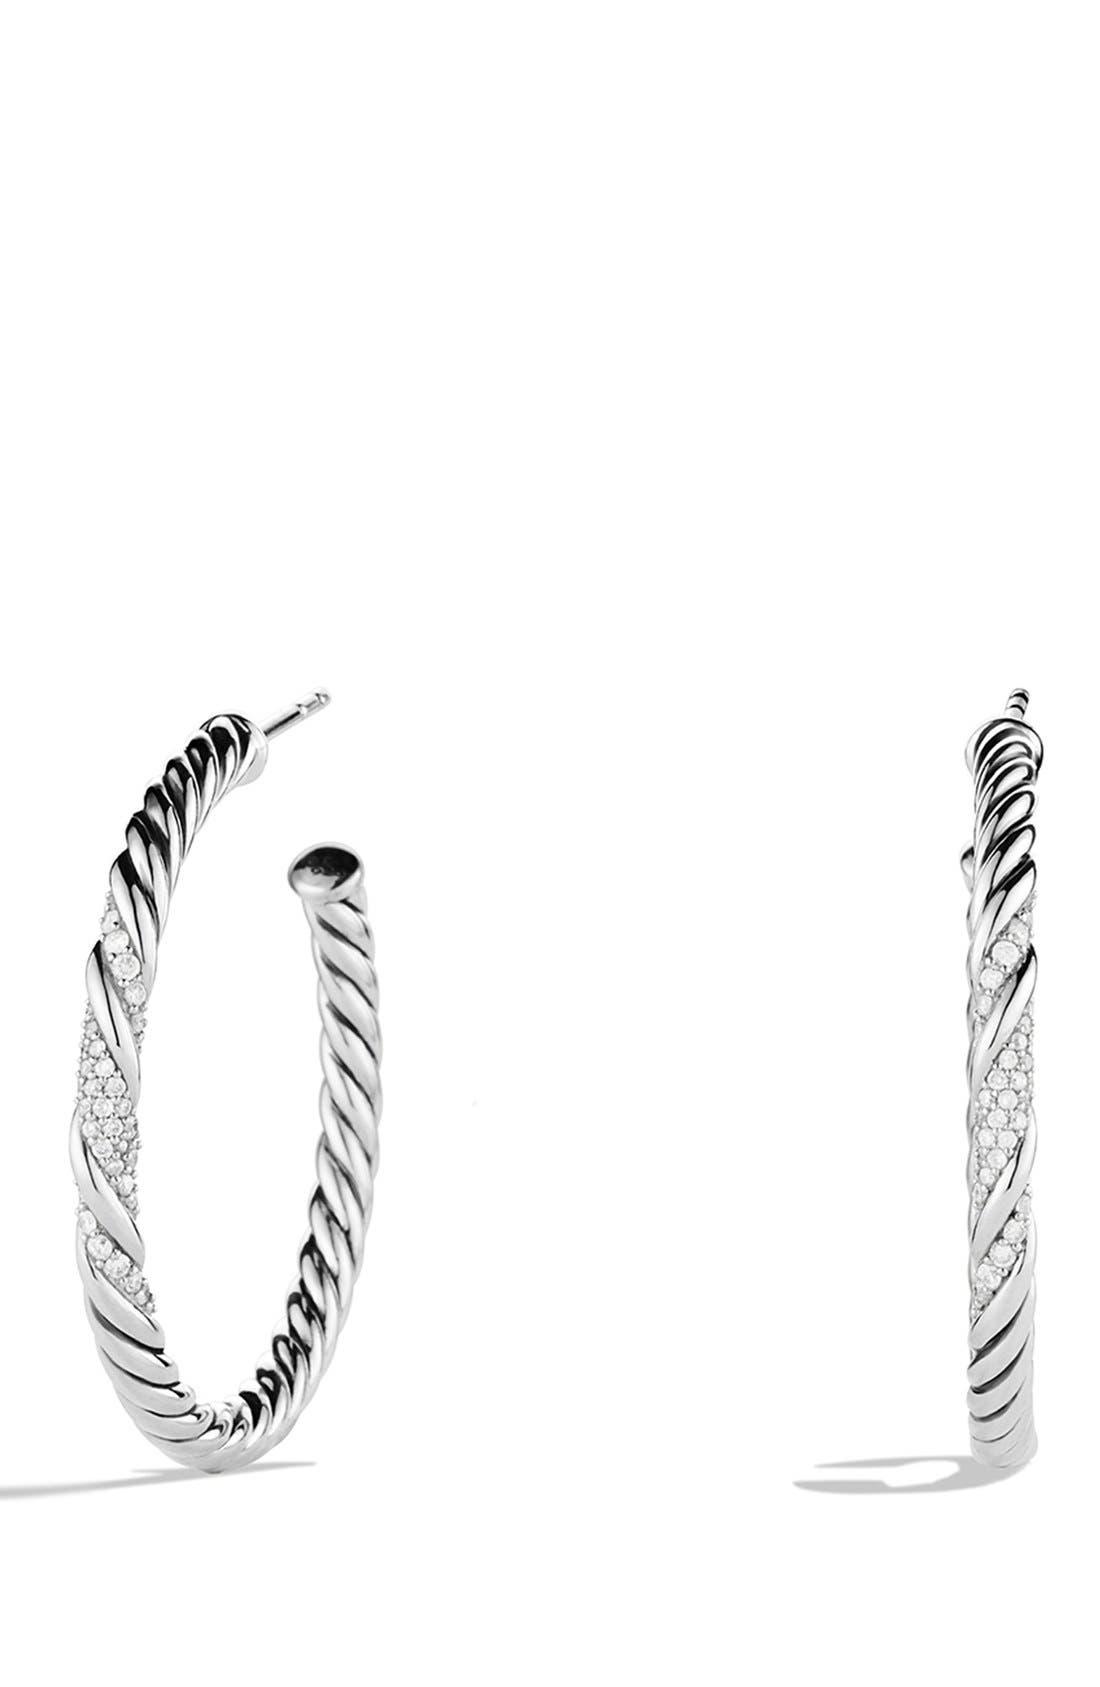 Main Image - David Yurman 'Willow' Medium Hoop Earrings with Diamonds